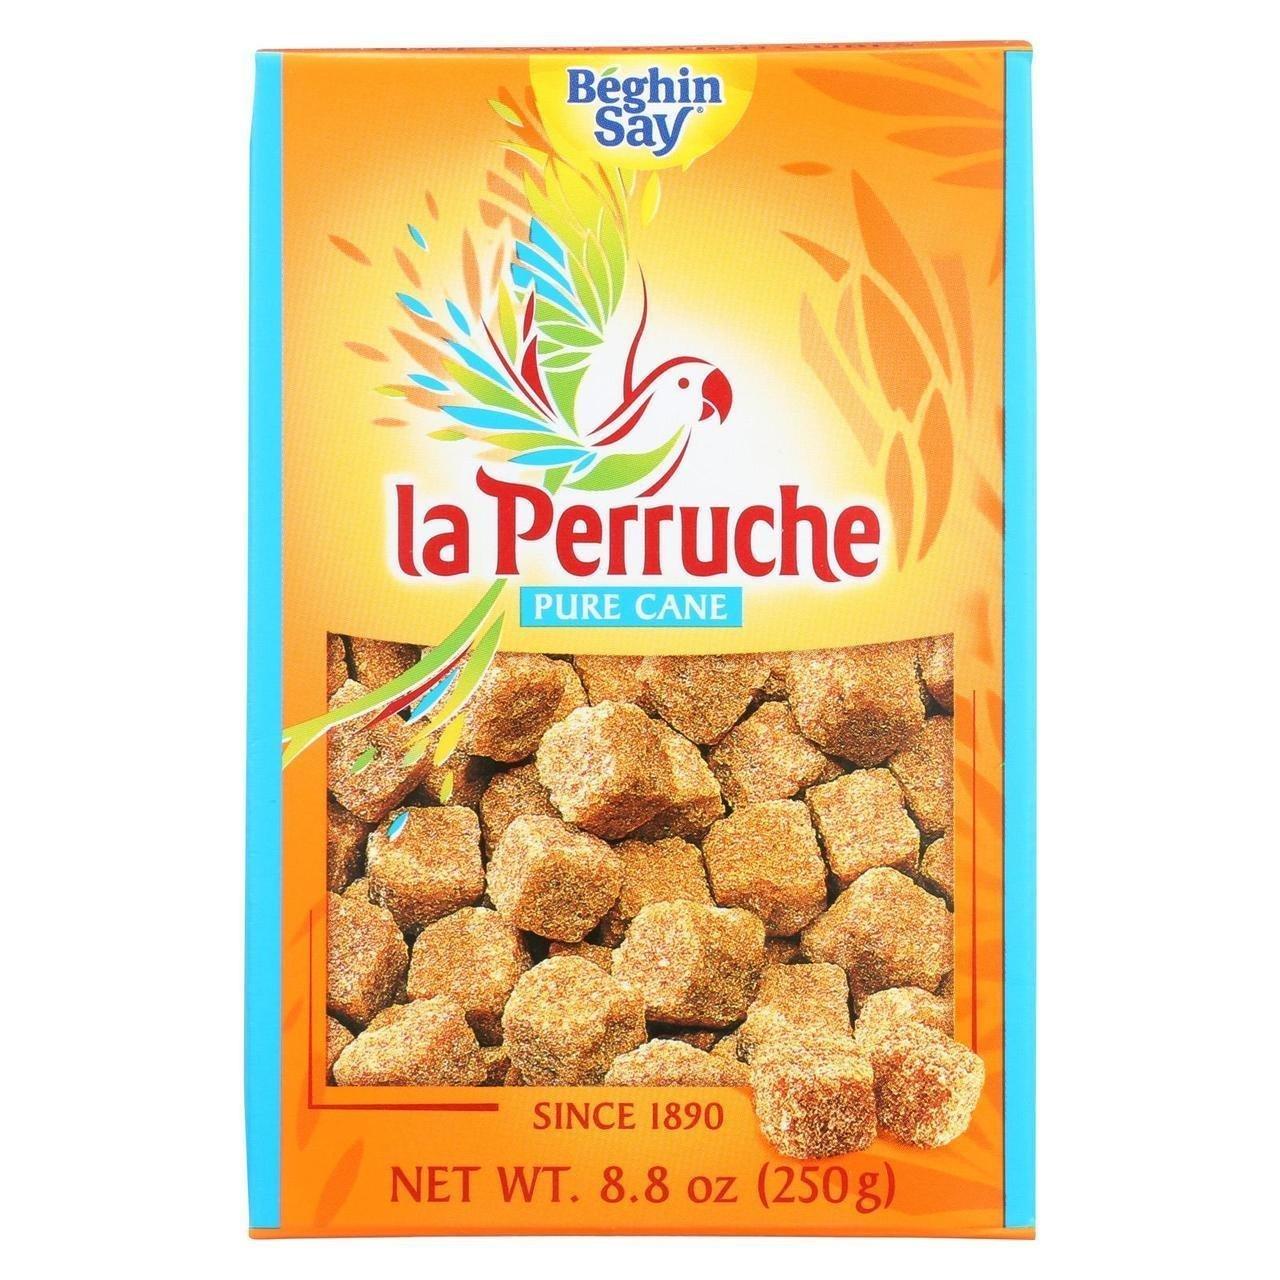 La Perruche Rough Cut Brown Sugar Cubes 8.8 oz Max 61% Albuquerque Mall OFF - of Pack 4